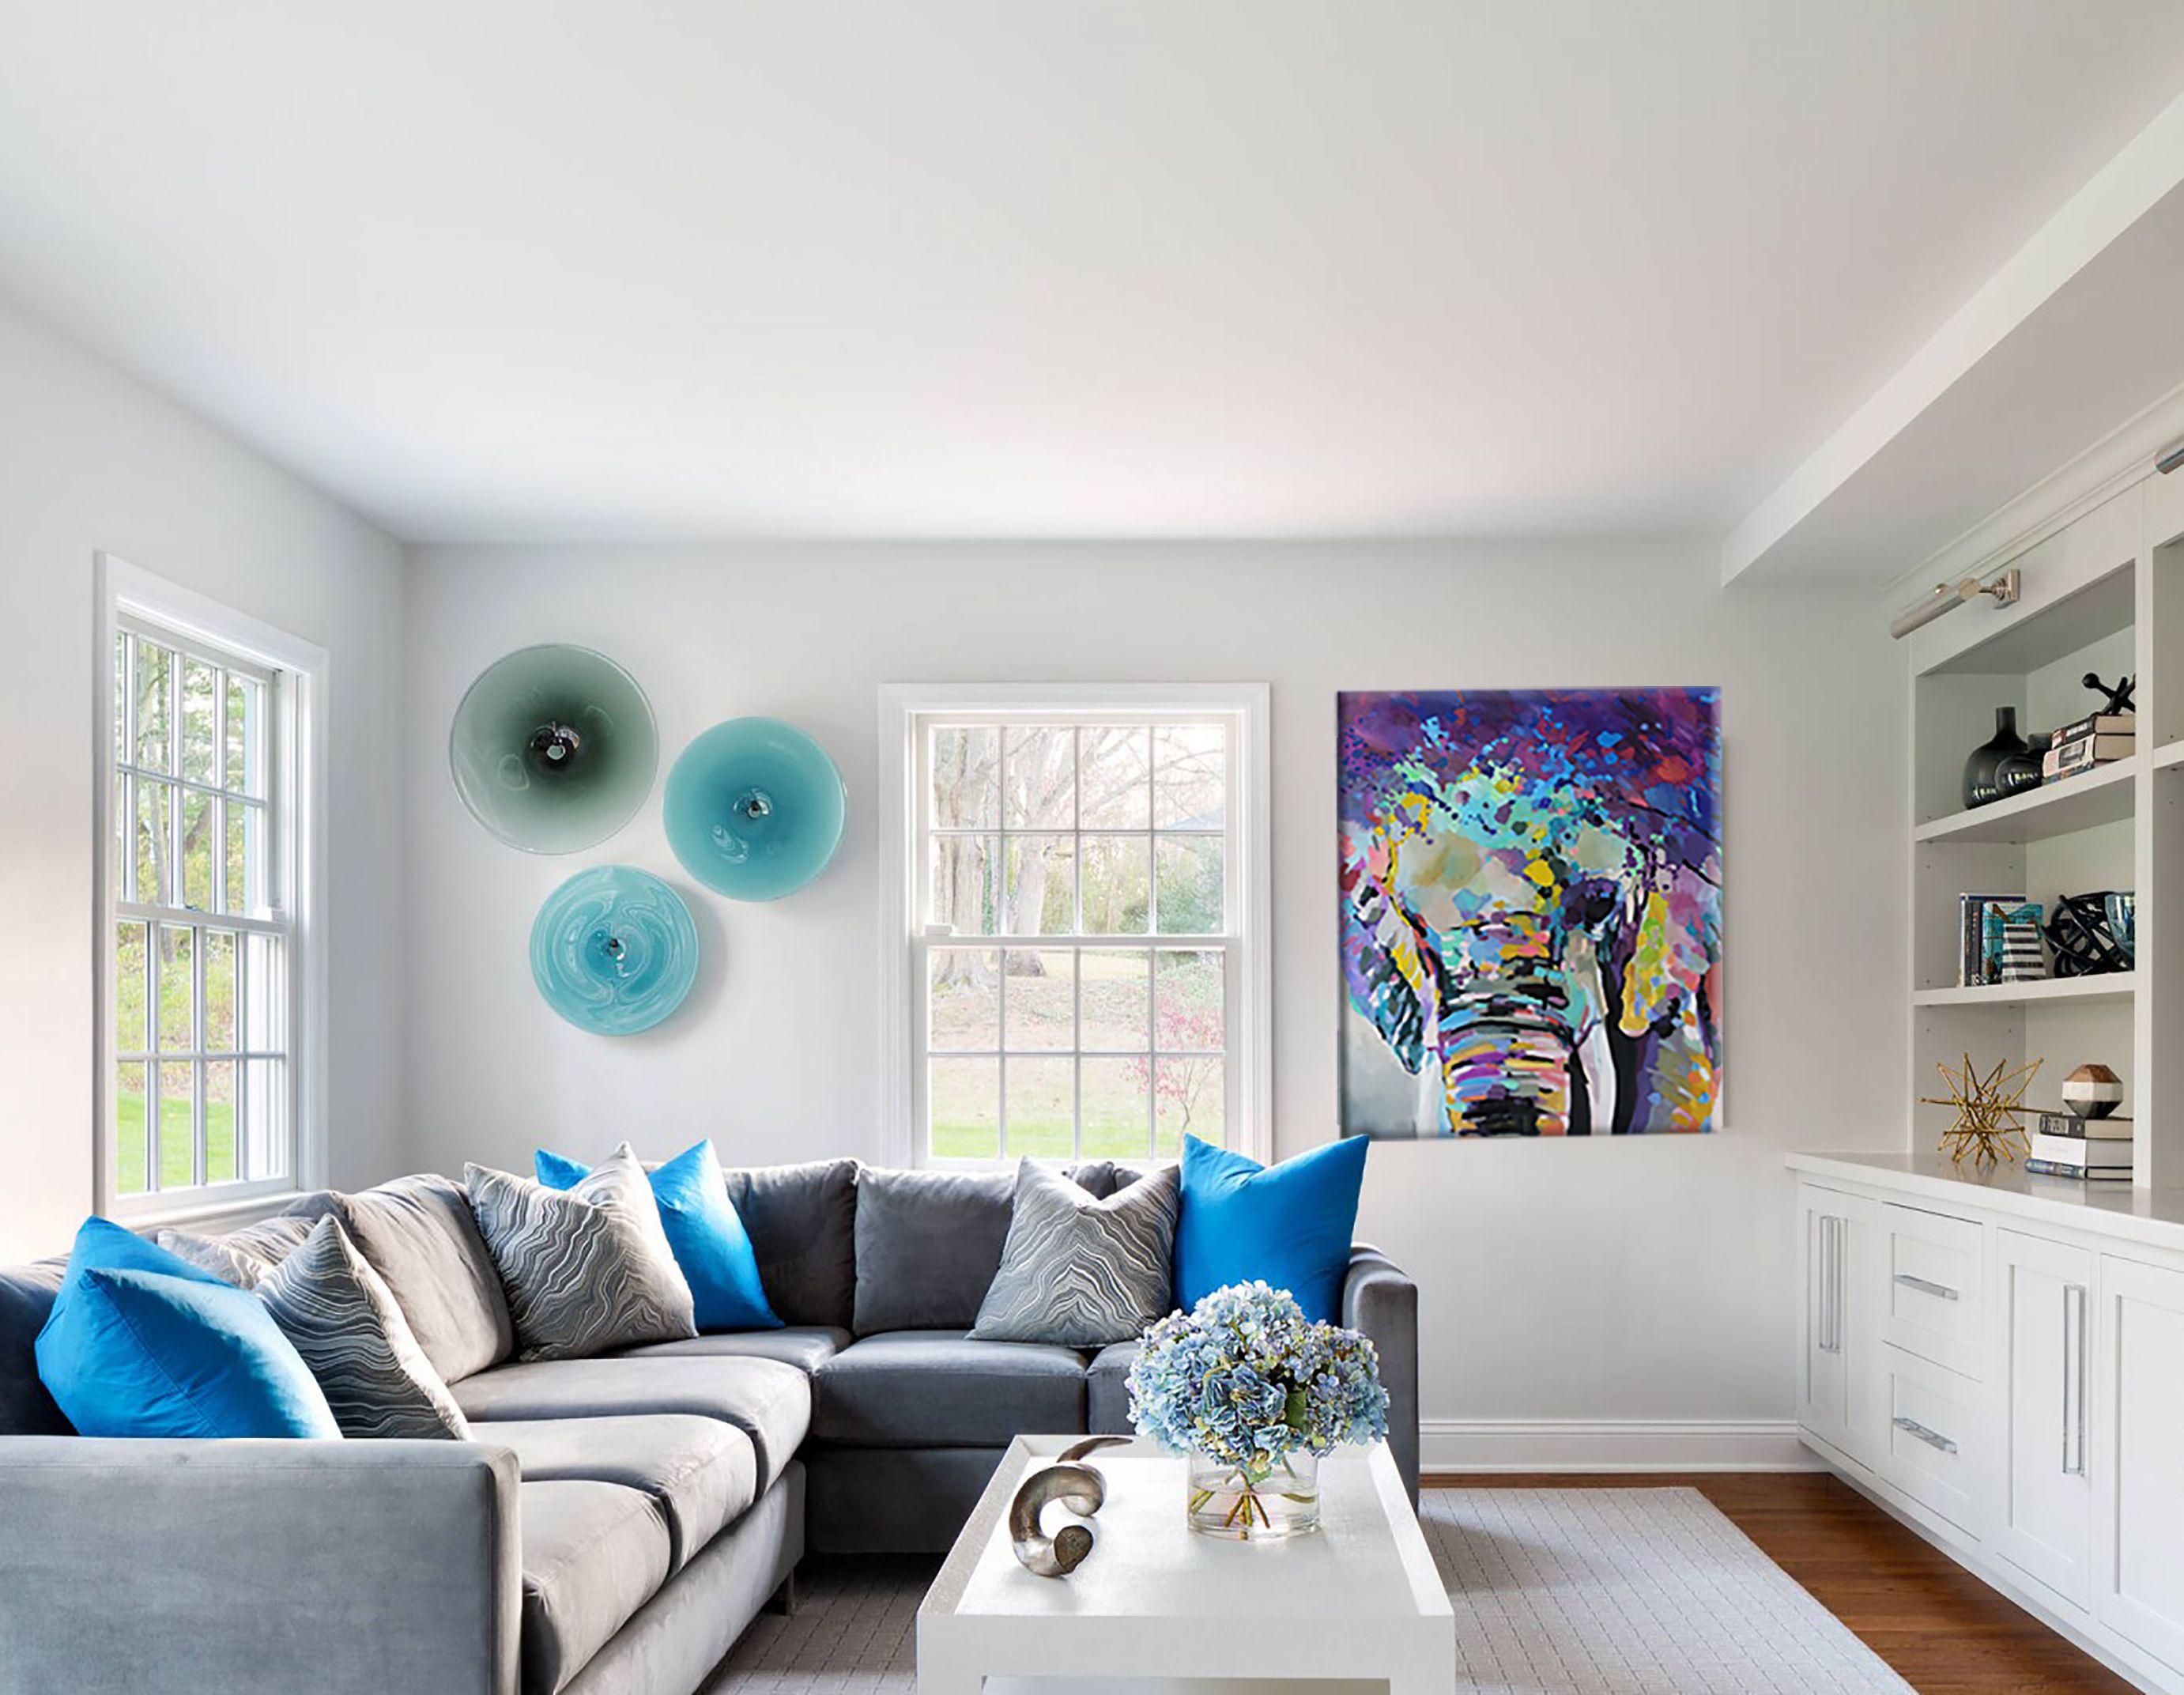 Pinнастя Артамонова On Paintingartamonova  Pinterest Extraordinary Clean Living Room Decorating Design